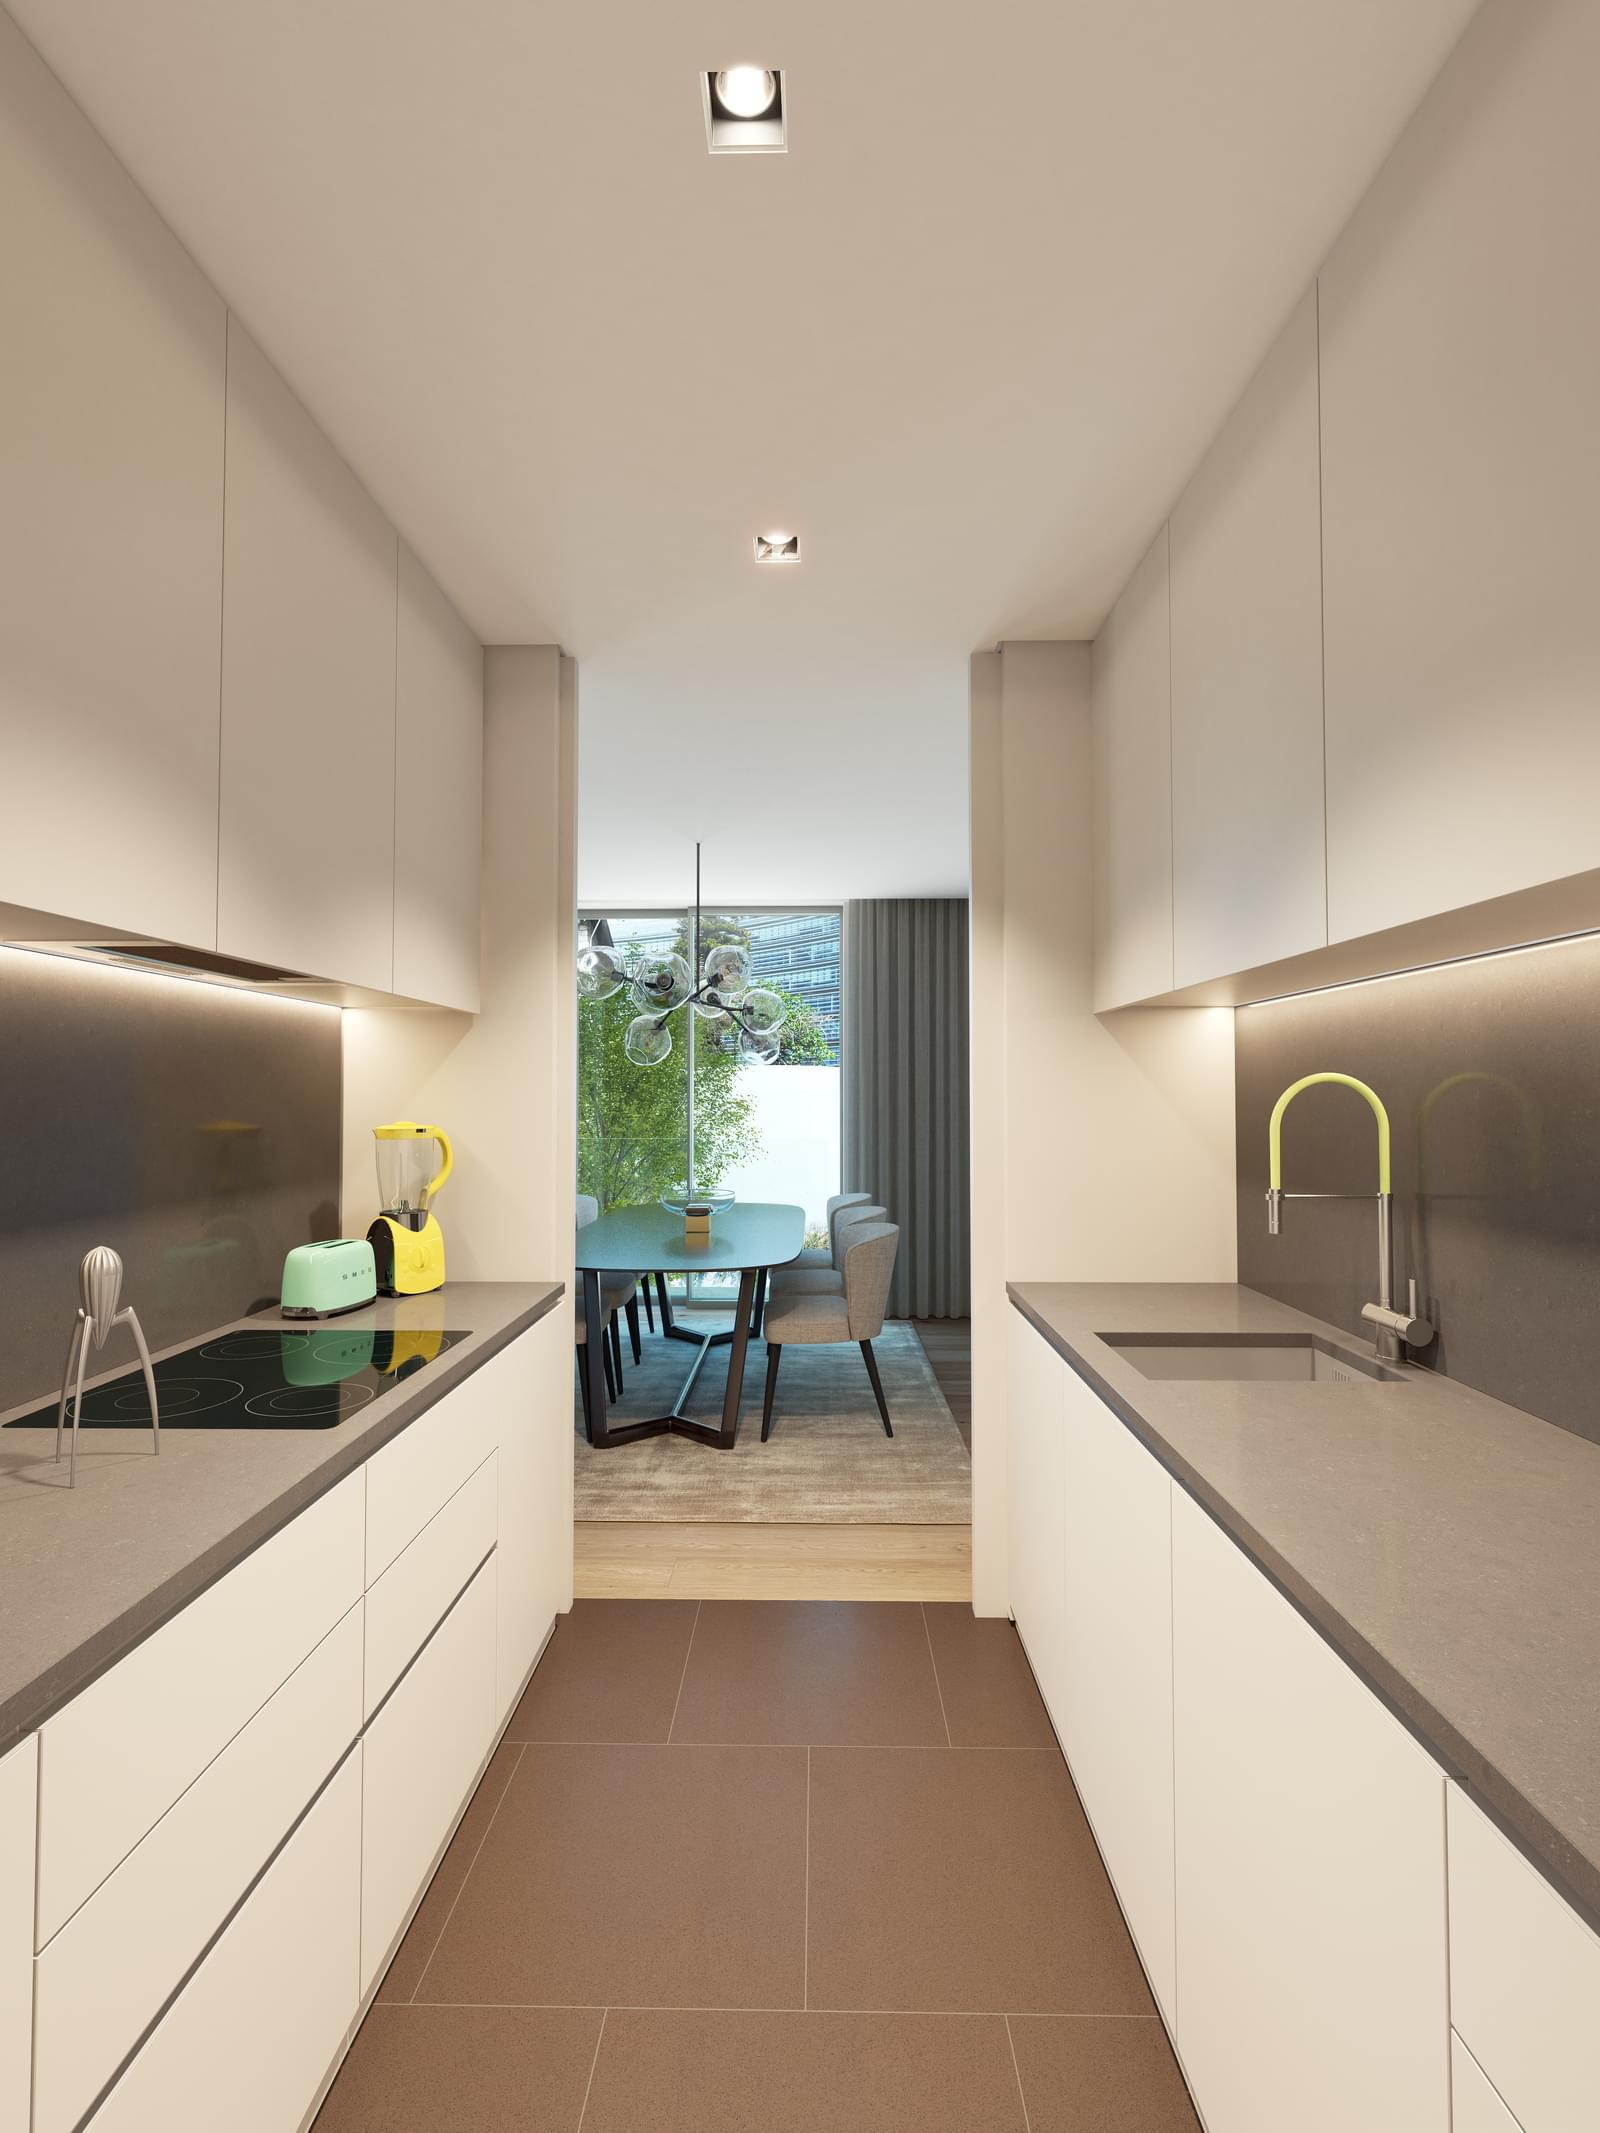 amoreiras-residence-d288358c-1ac1-4caa-b88b-26645dda44e5